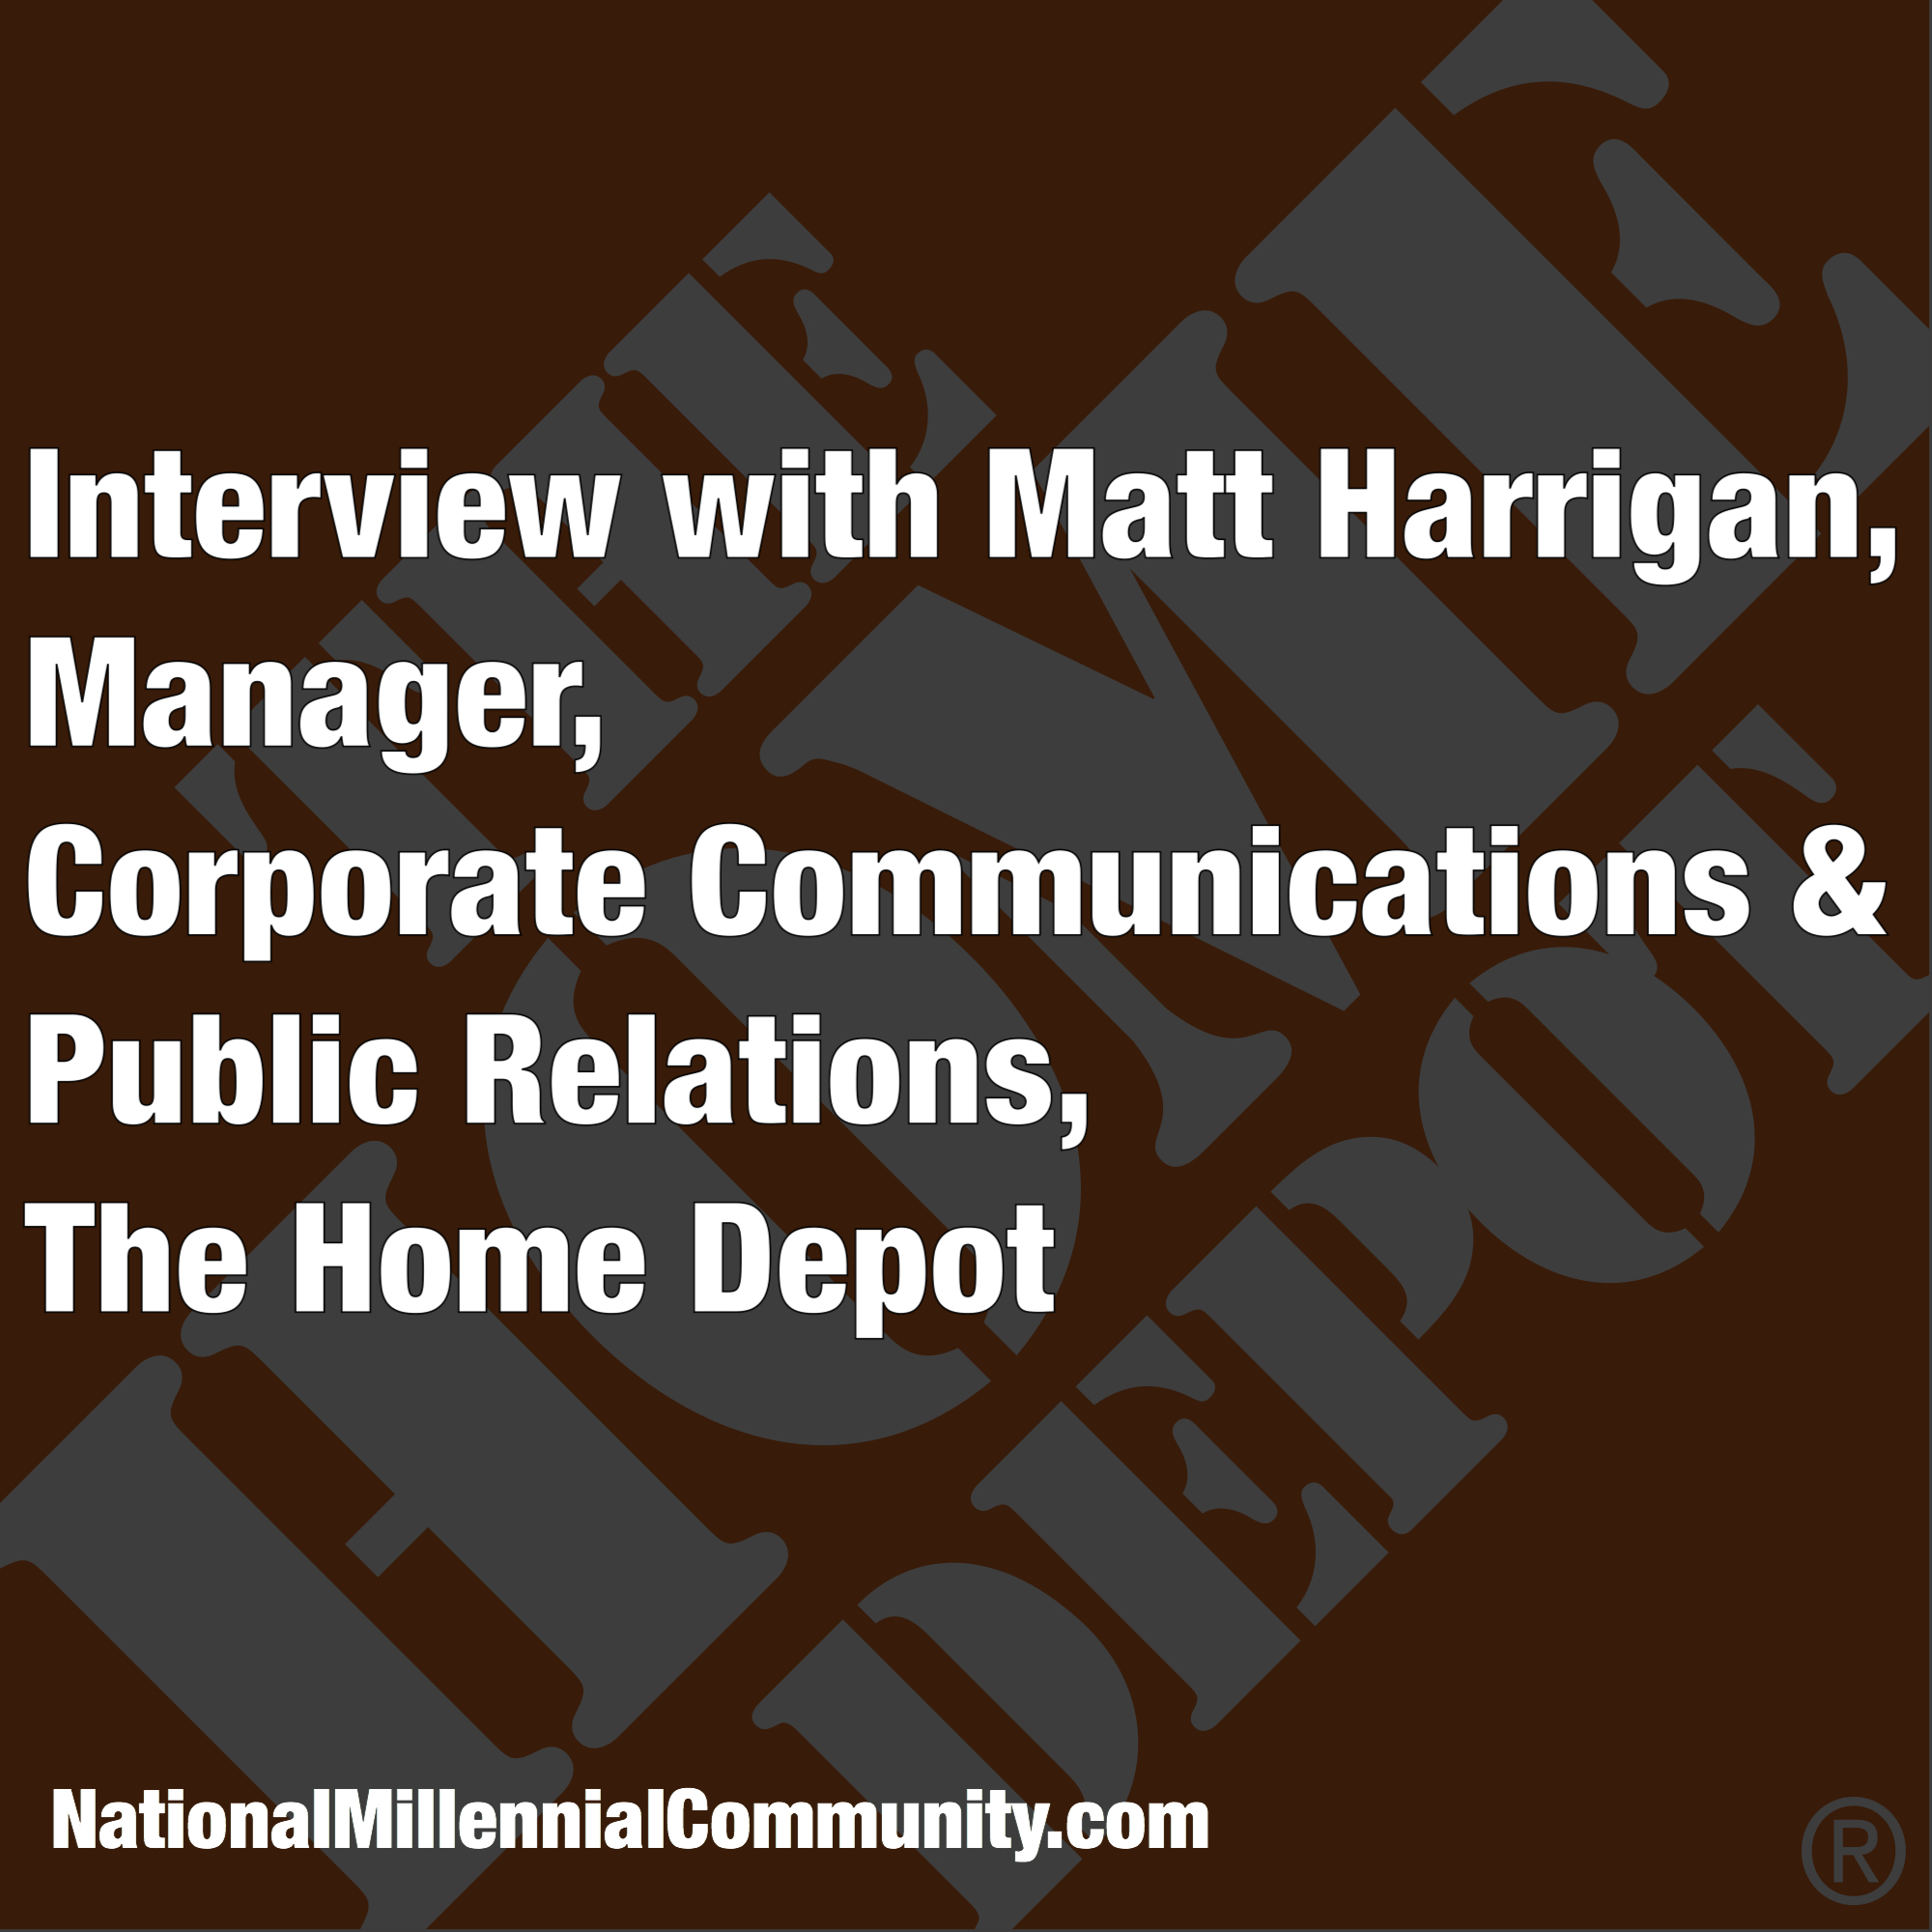 interview matt harrigan manager corporate communication interview matt harrigan manager corporate communication public relations the home depot national millennial community